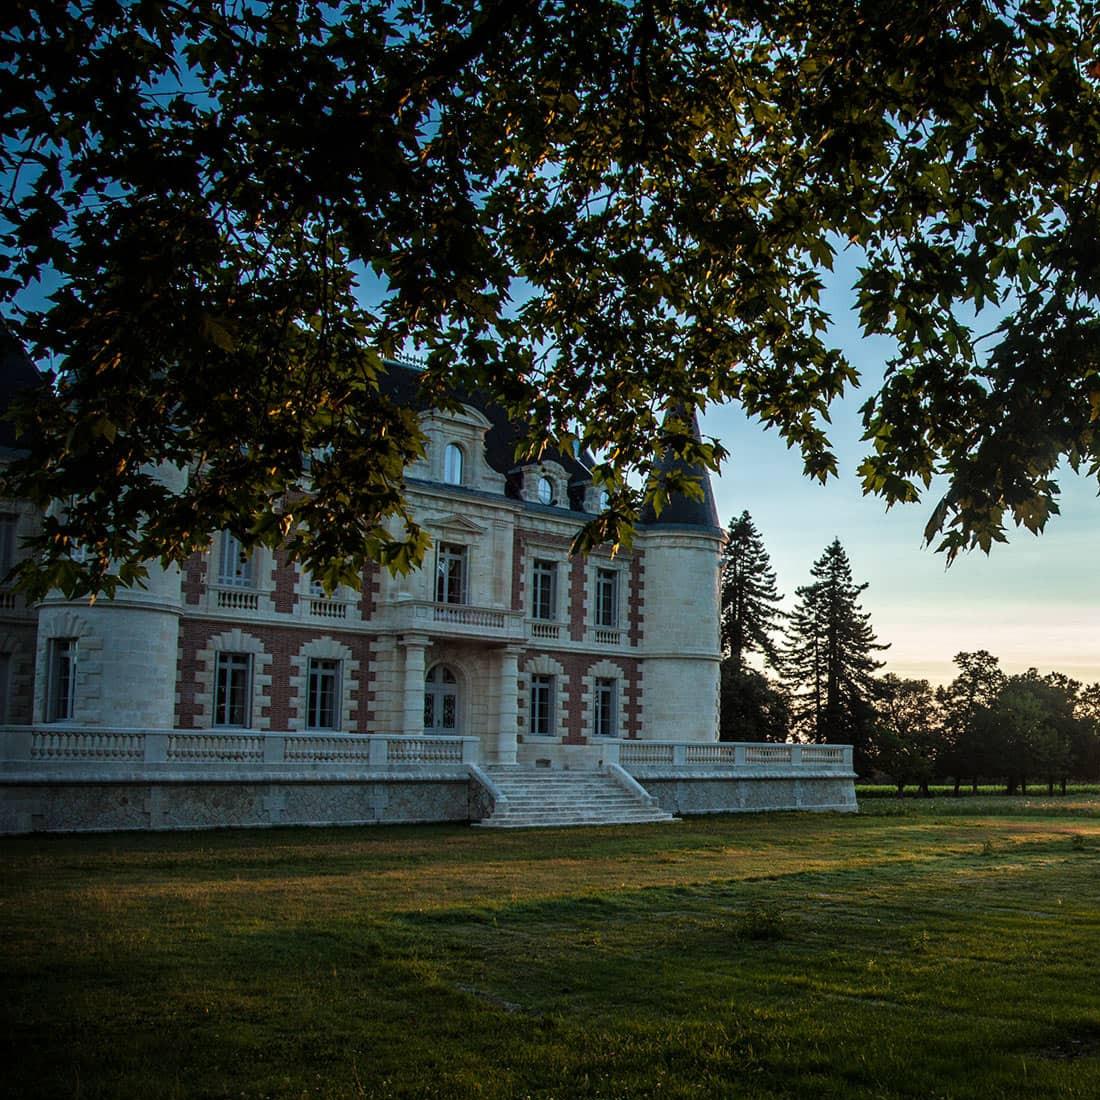 宝爵龙酒庄(Chateau Lamothe Bergeron)